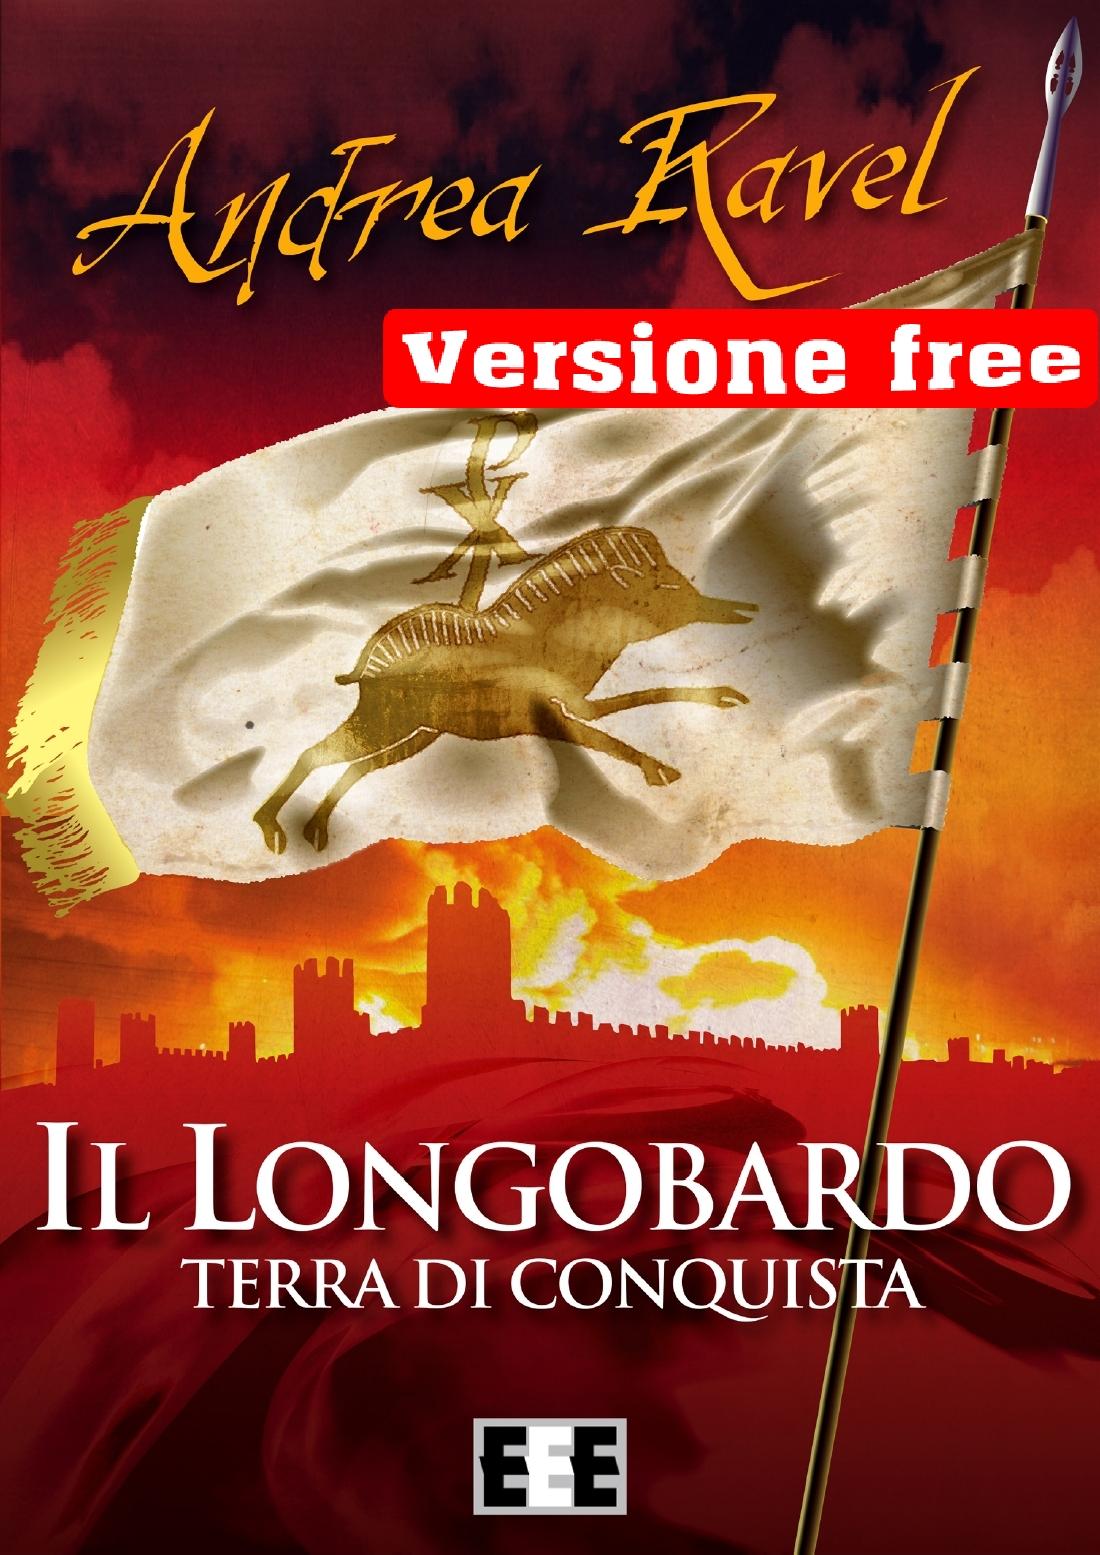 Ravel_cover_FREE